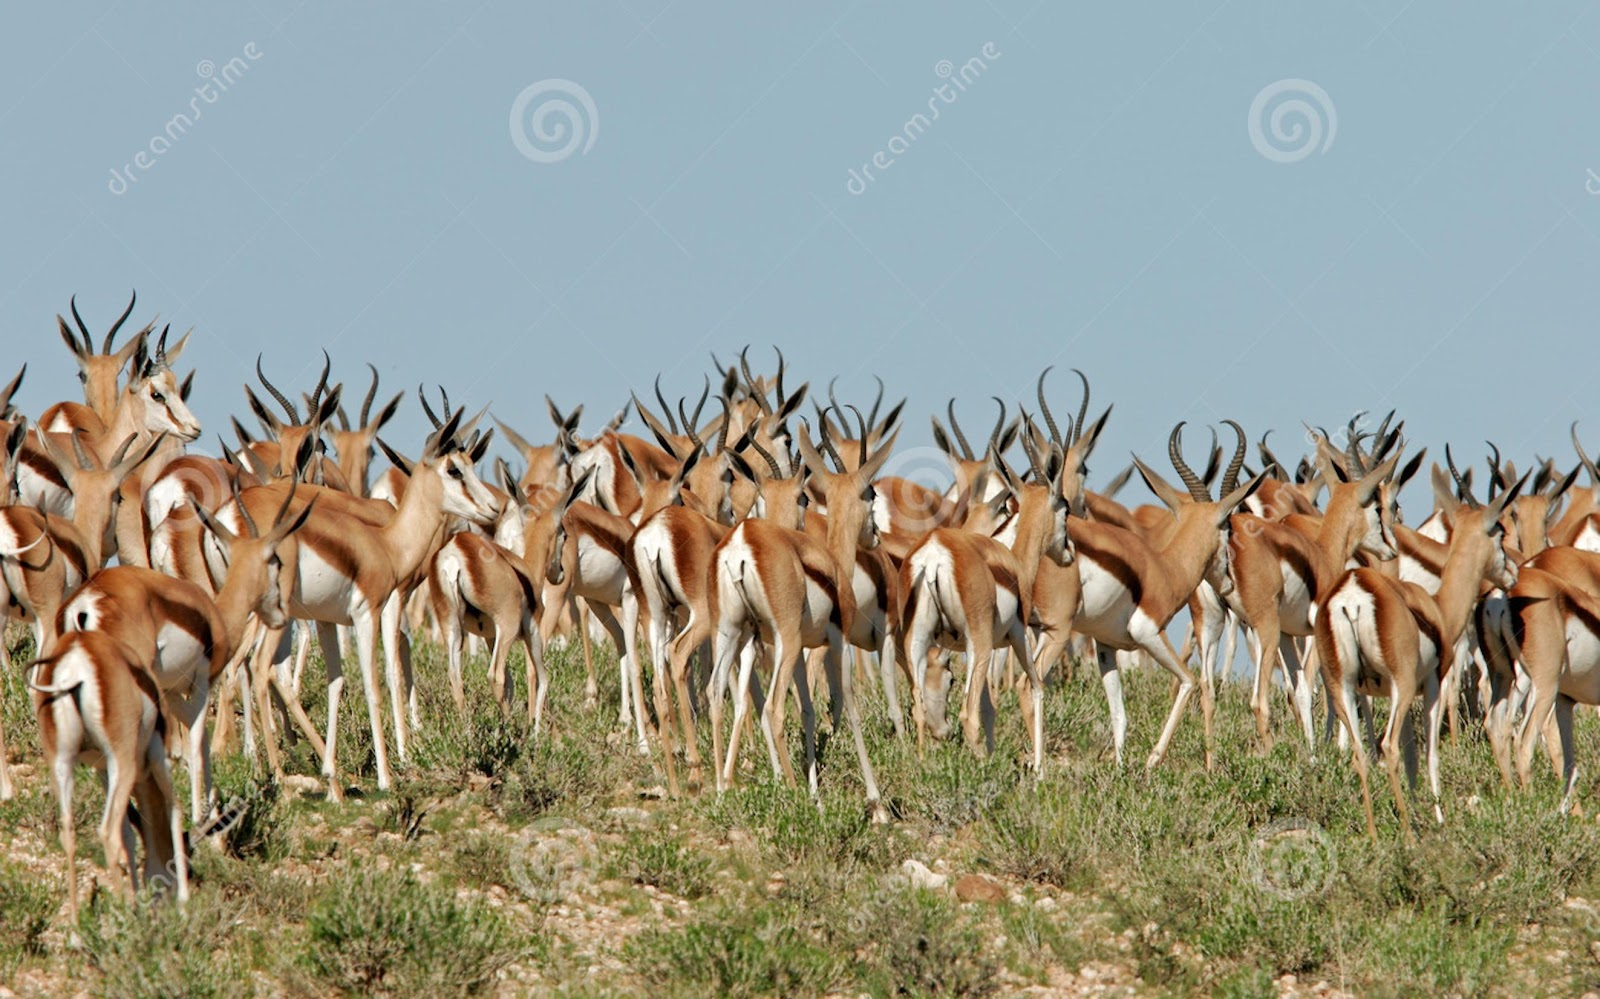 ../../Desktop/troupeau-d-antilopes-de-springbok-1308715.jpg